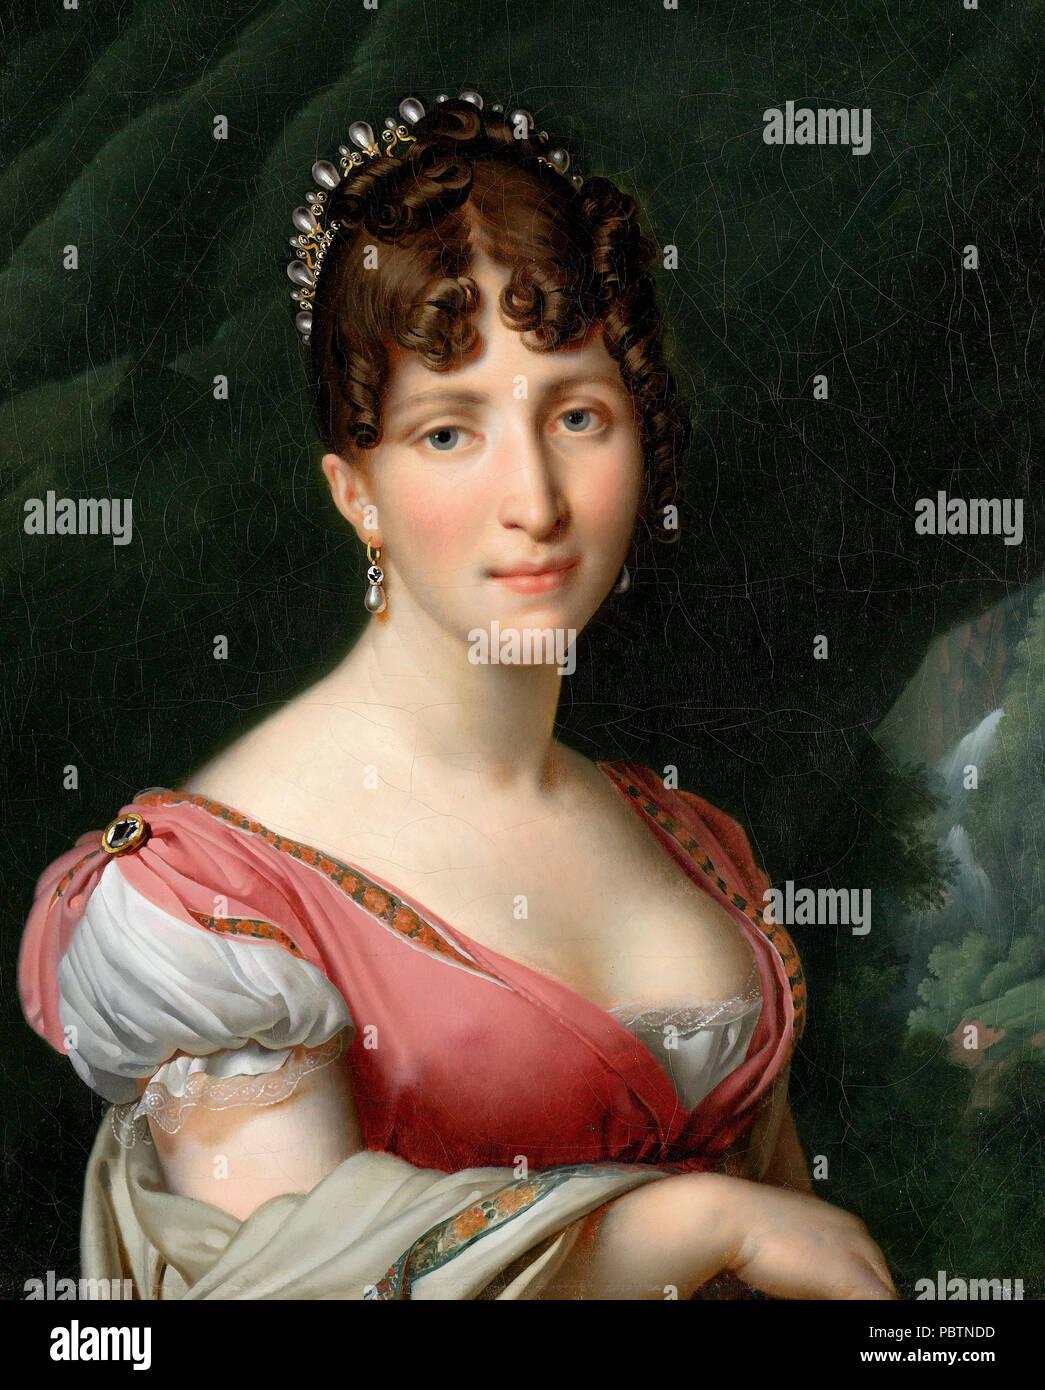 Portrait of Hortense de Beauharnais, Queen of Holland, wife of King Louis Napoleon. Anne-Louis Girodet de Roussy-Trioson, circa 1805 Stock Photo